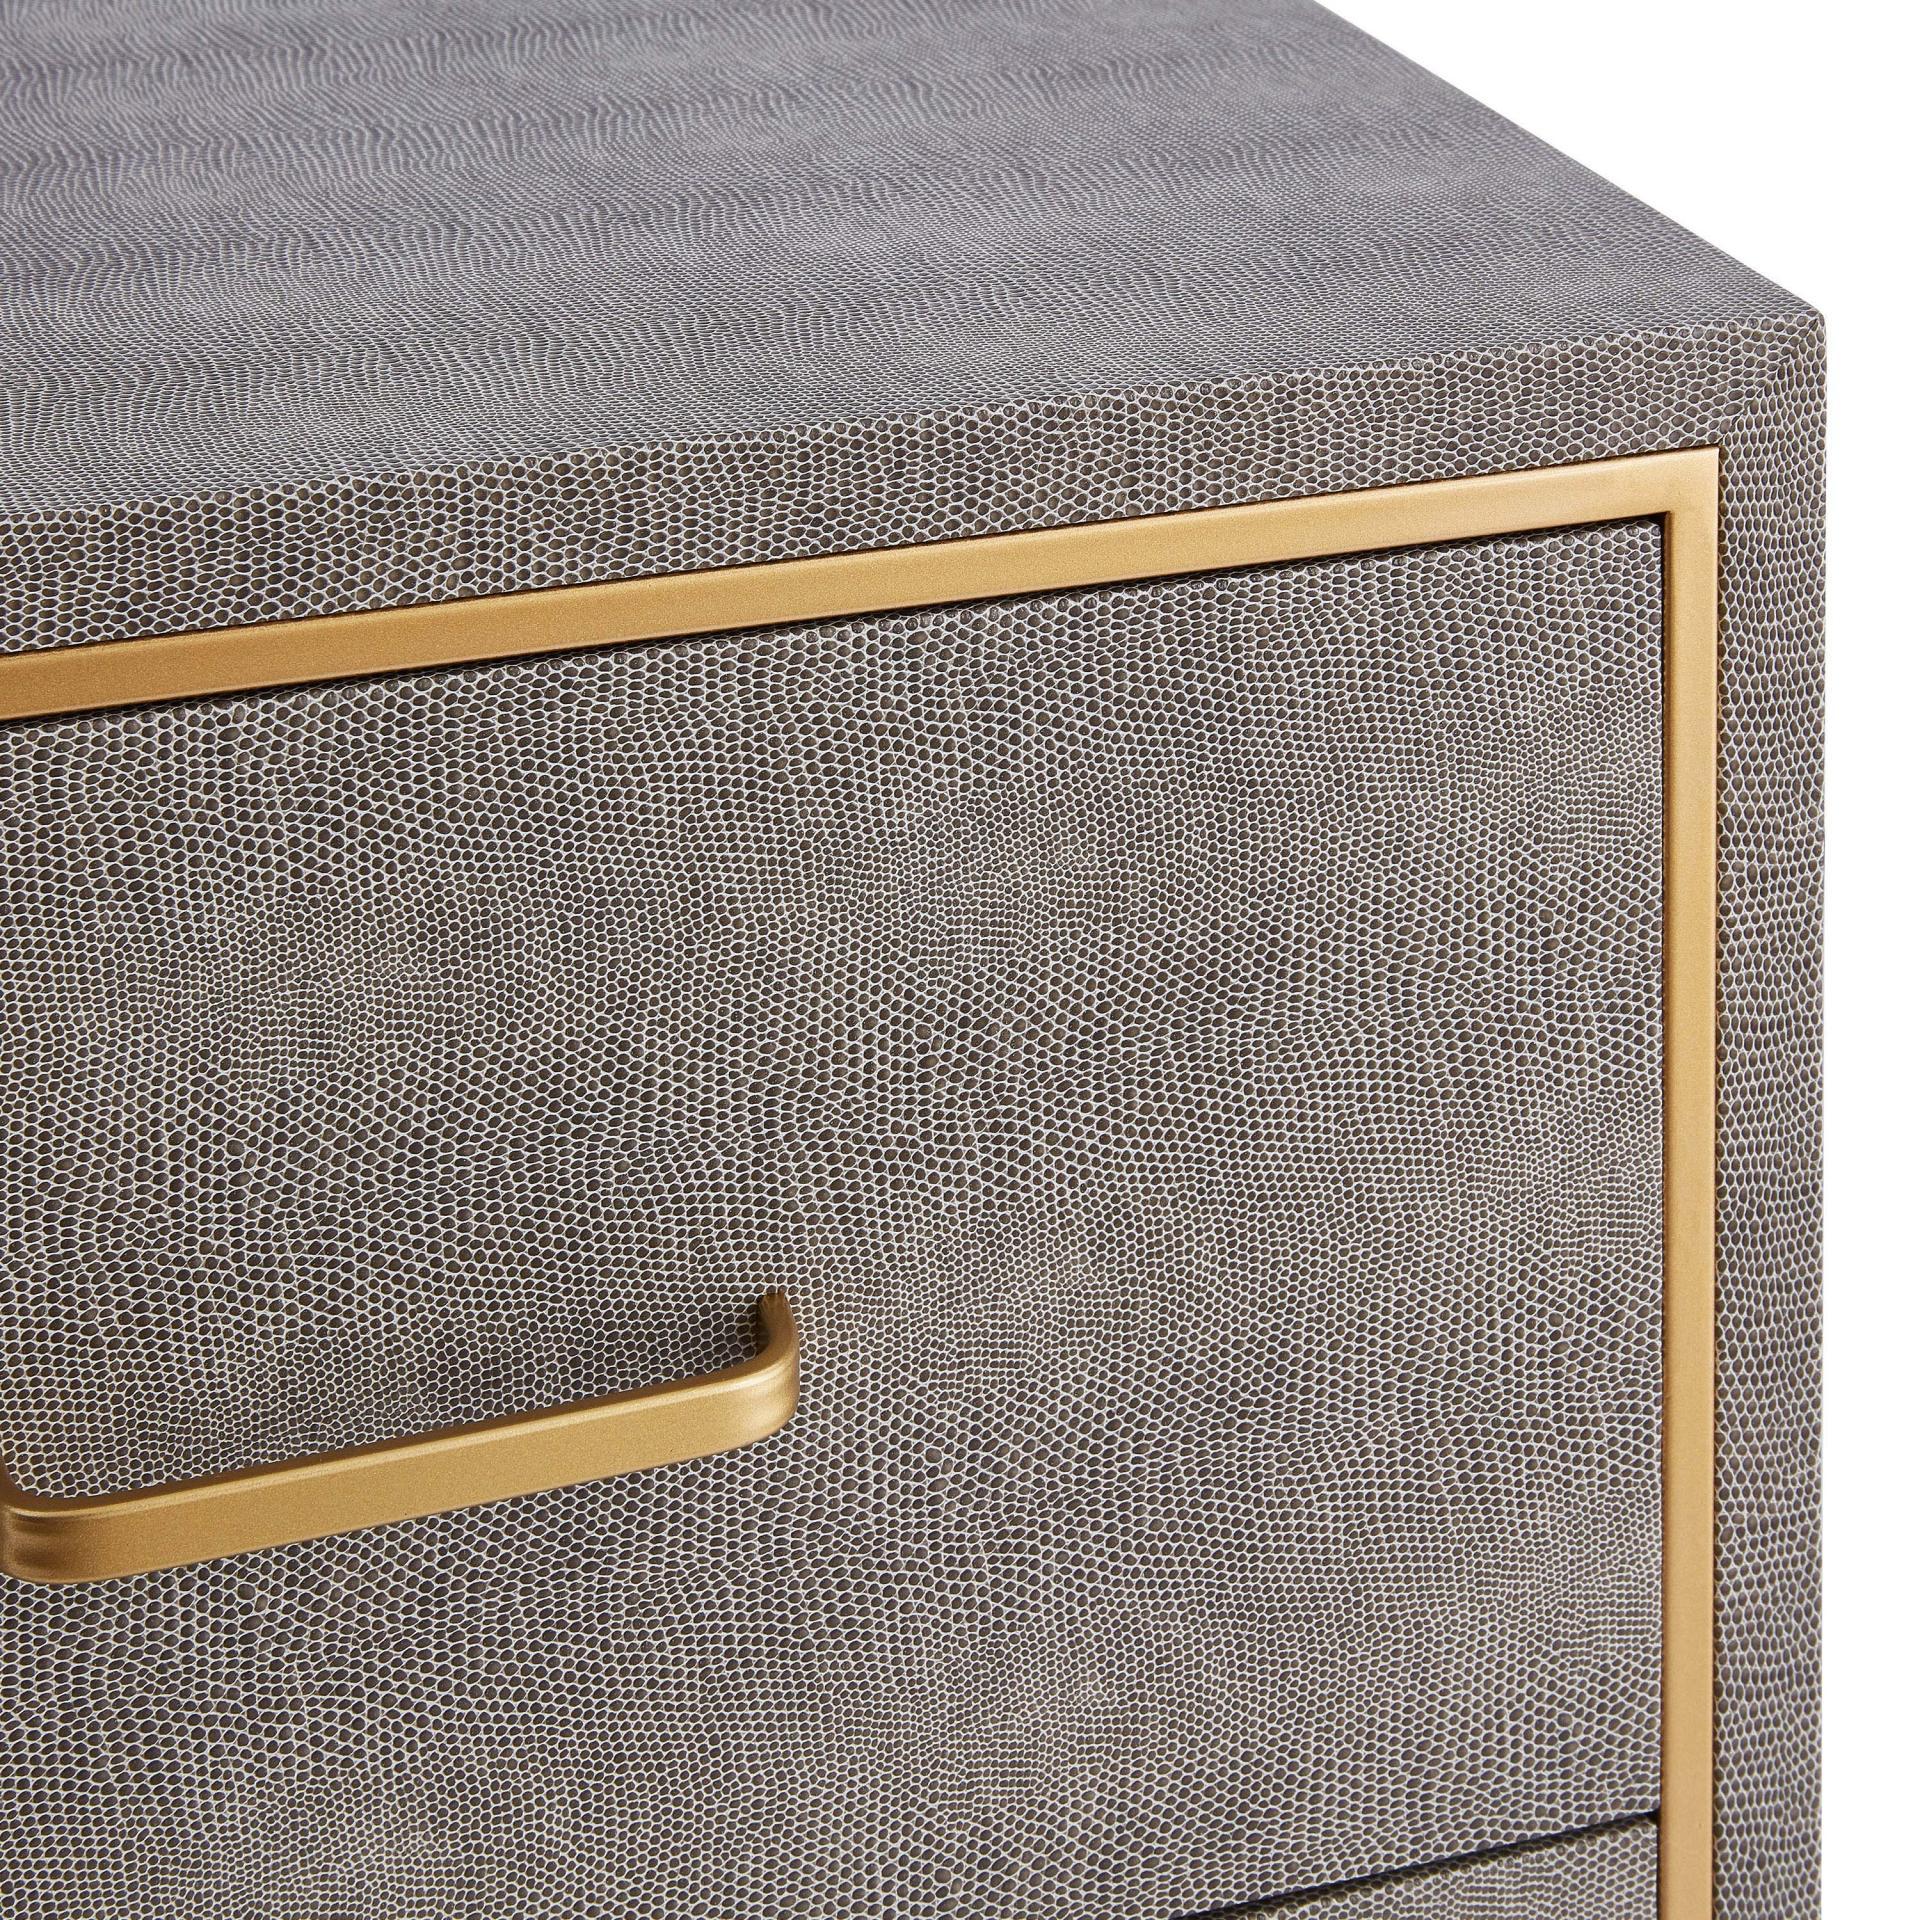 1600048 Npd Home Furniture Wholesale Lifestyle Furnishings